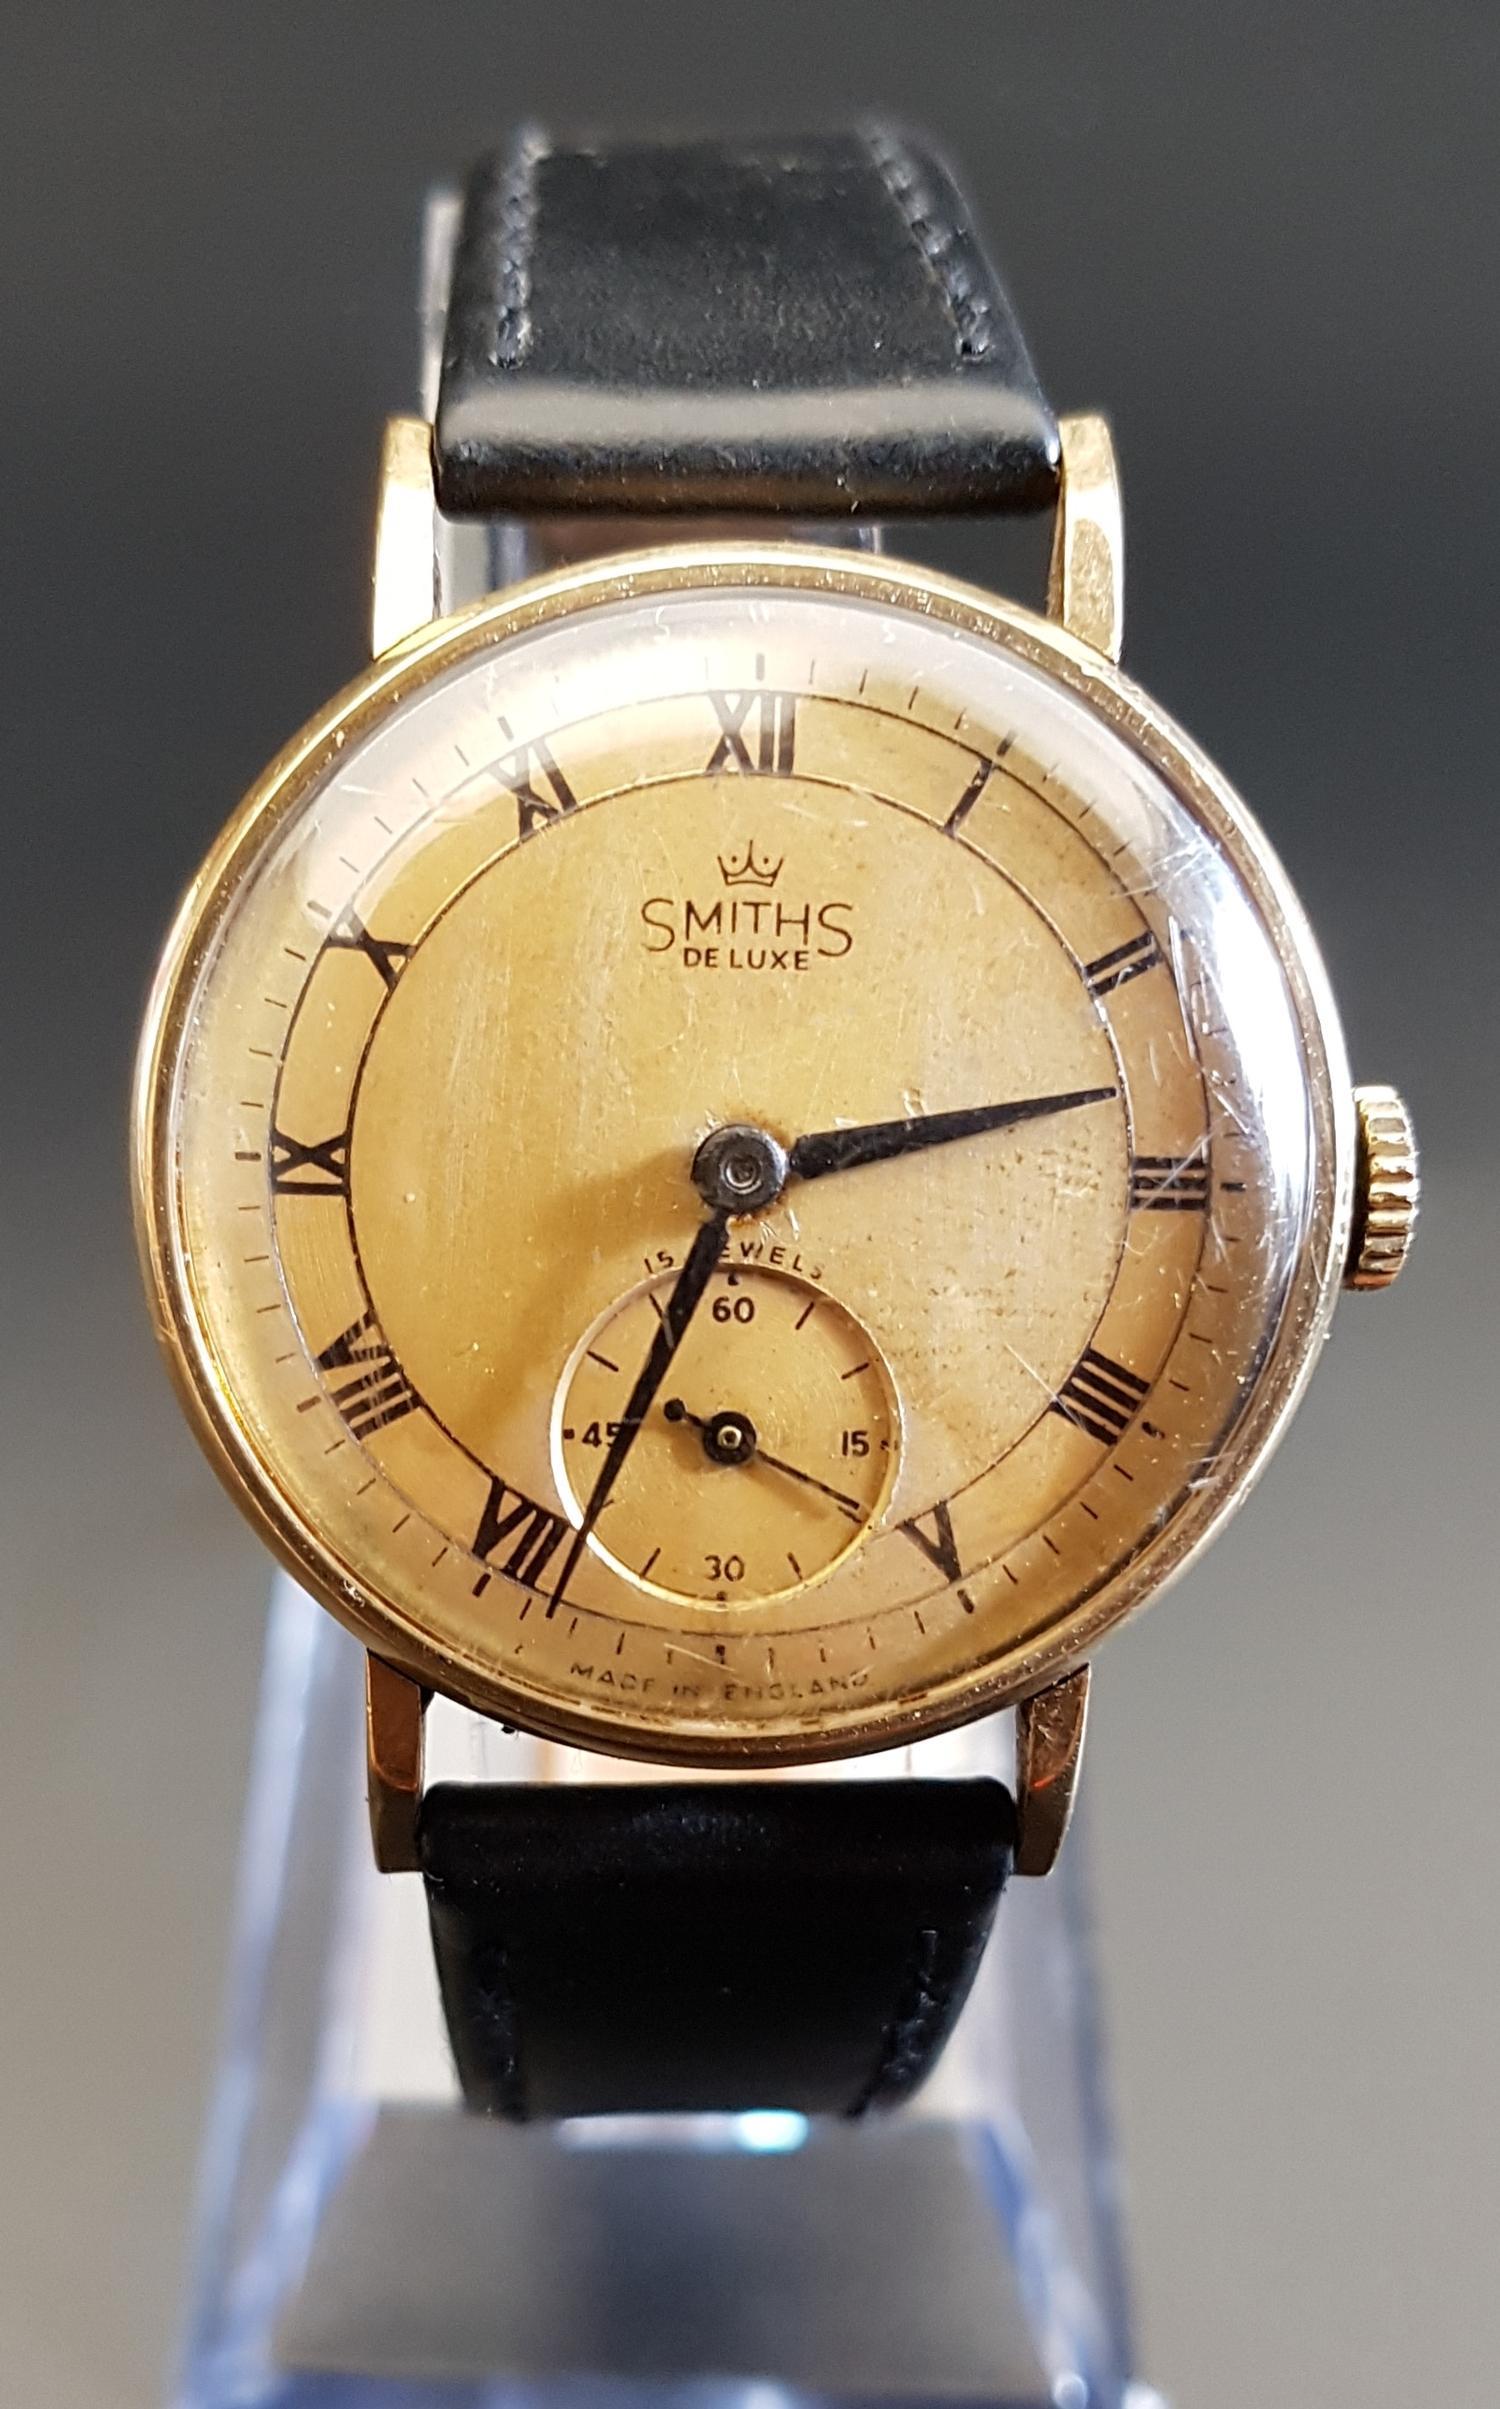 Lot 14 - GENTLEMAN'S NINE CARAT GOLD CASED SMITHS DE LUXE WRISTWATCH 1950s, the gilt dial with Roman numerals